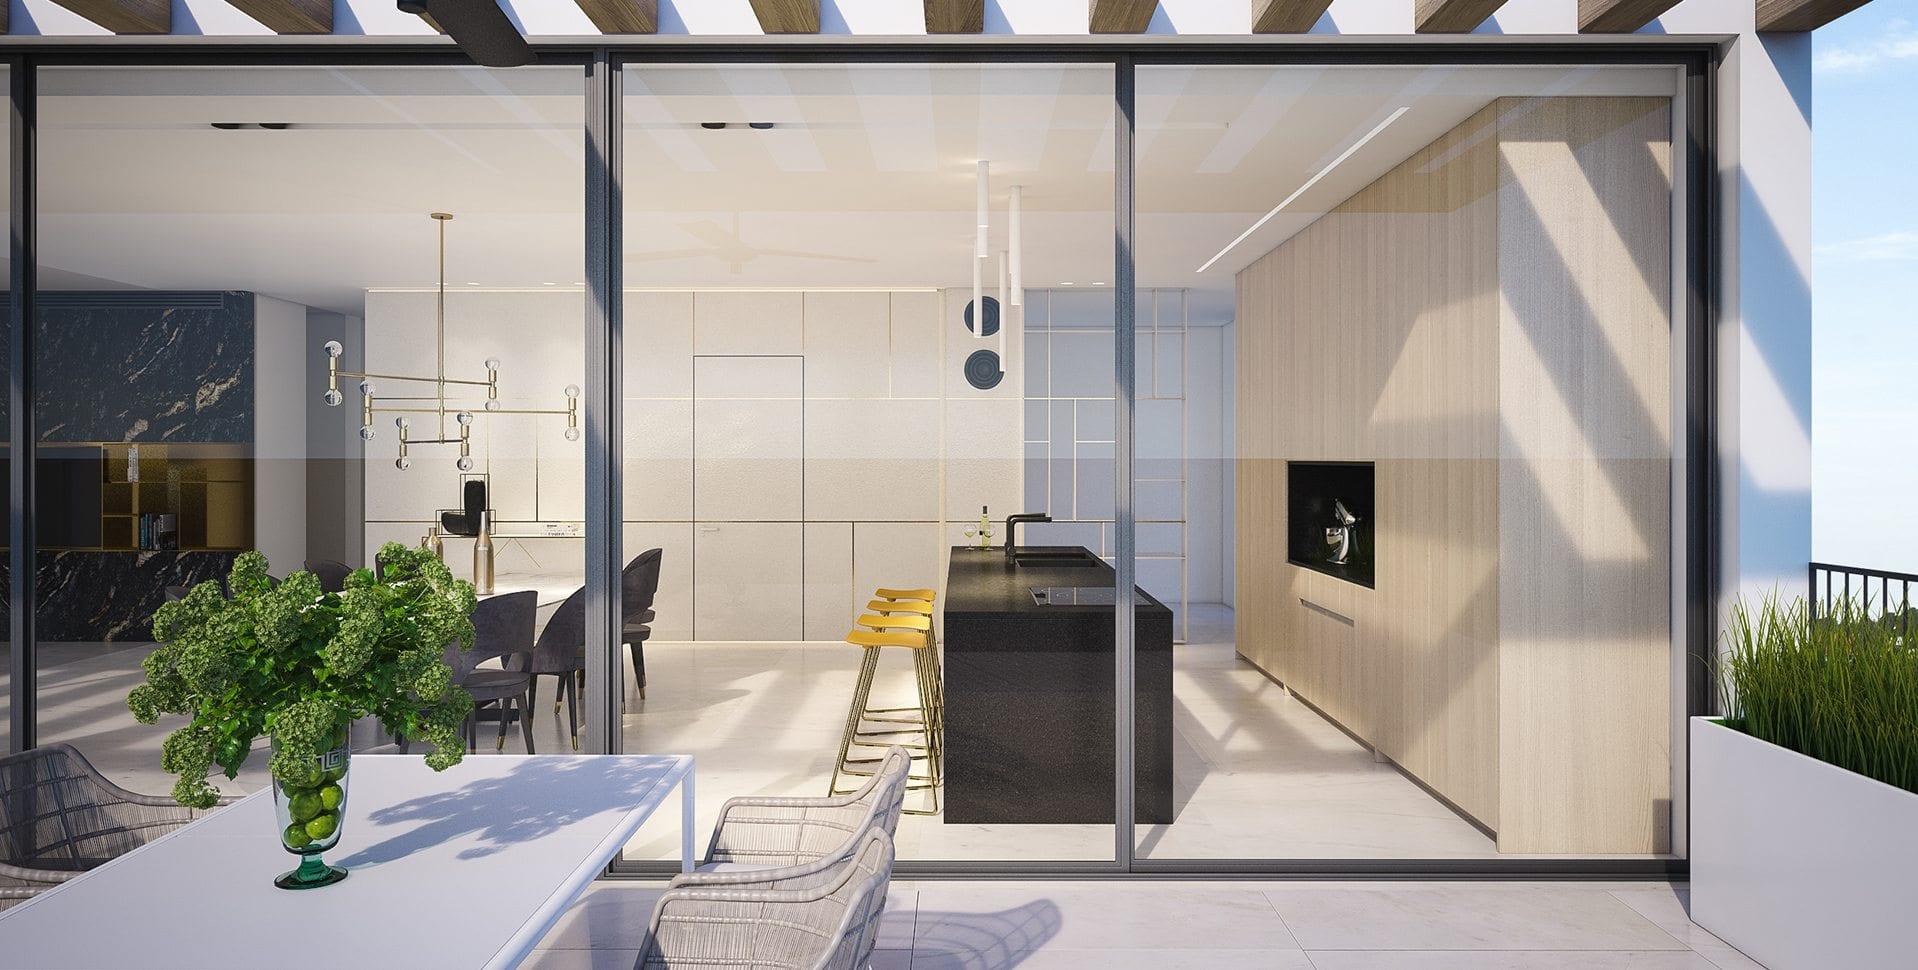 Maayan-Golan_Architectural-Visualization_ apartment-yehuda-halevi-tel-aviv_exterior-visualization_balcony_design-ws-studio_01